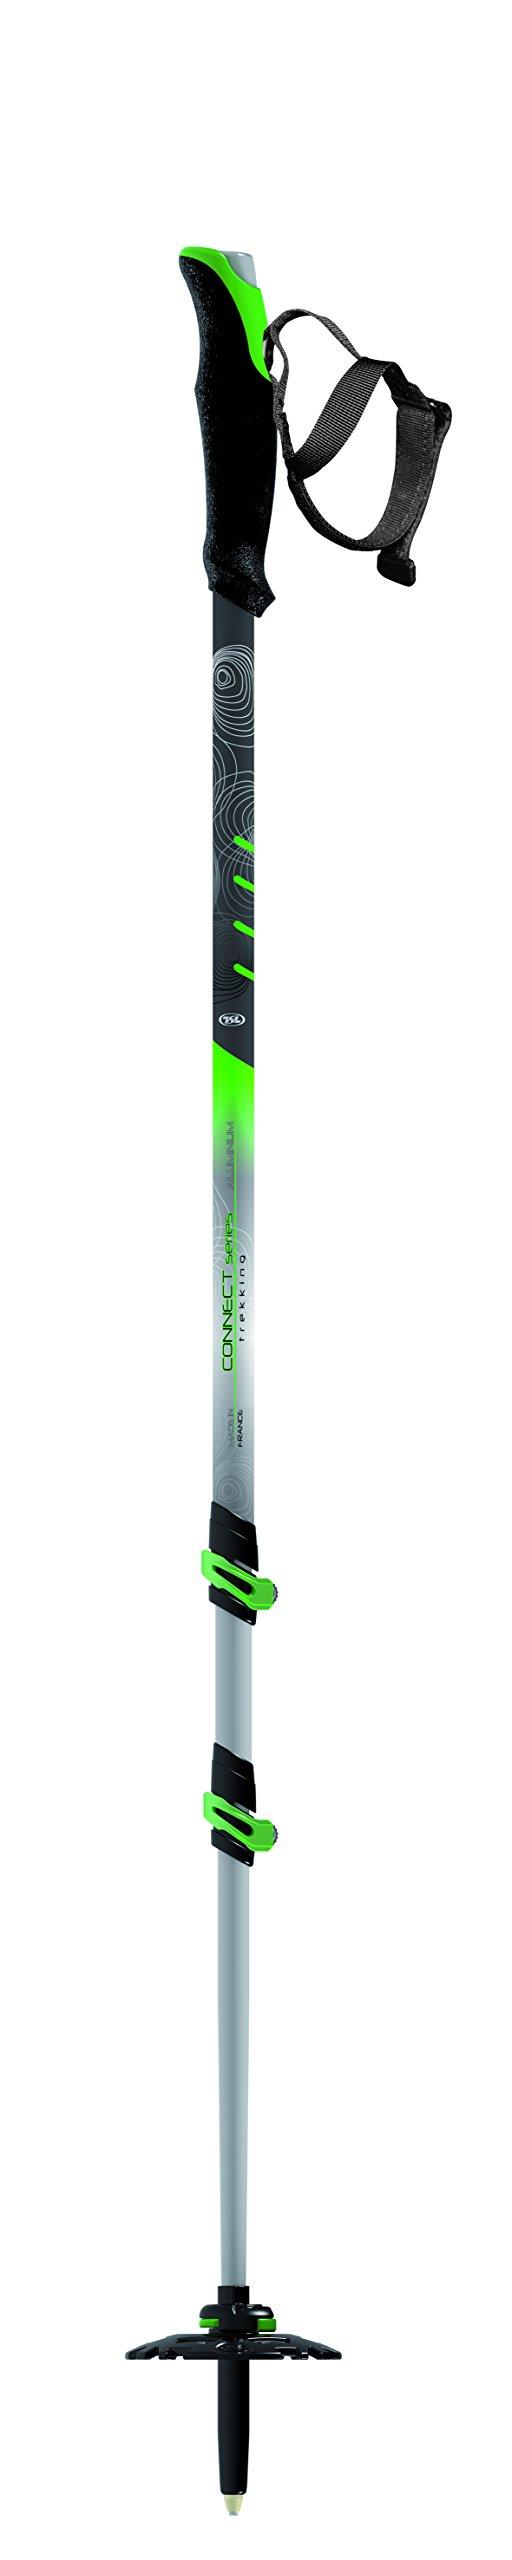 TSL Snowshoes Trek Aluminum 3 Part Poles, Green/Black, 28.5-55'' by TSL Snowshoes